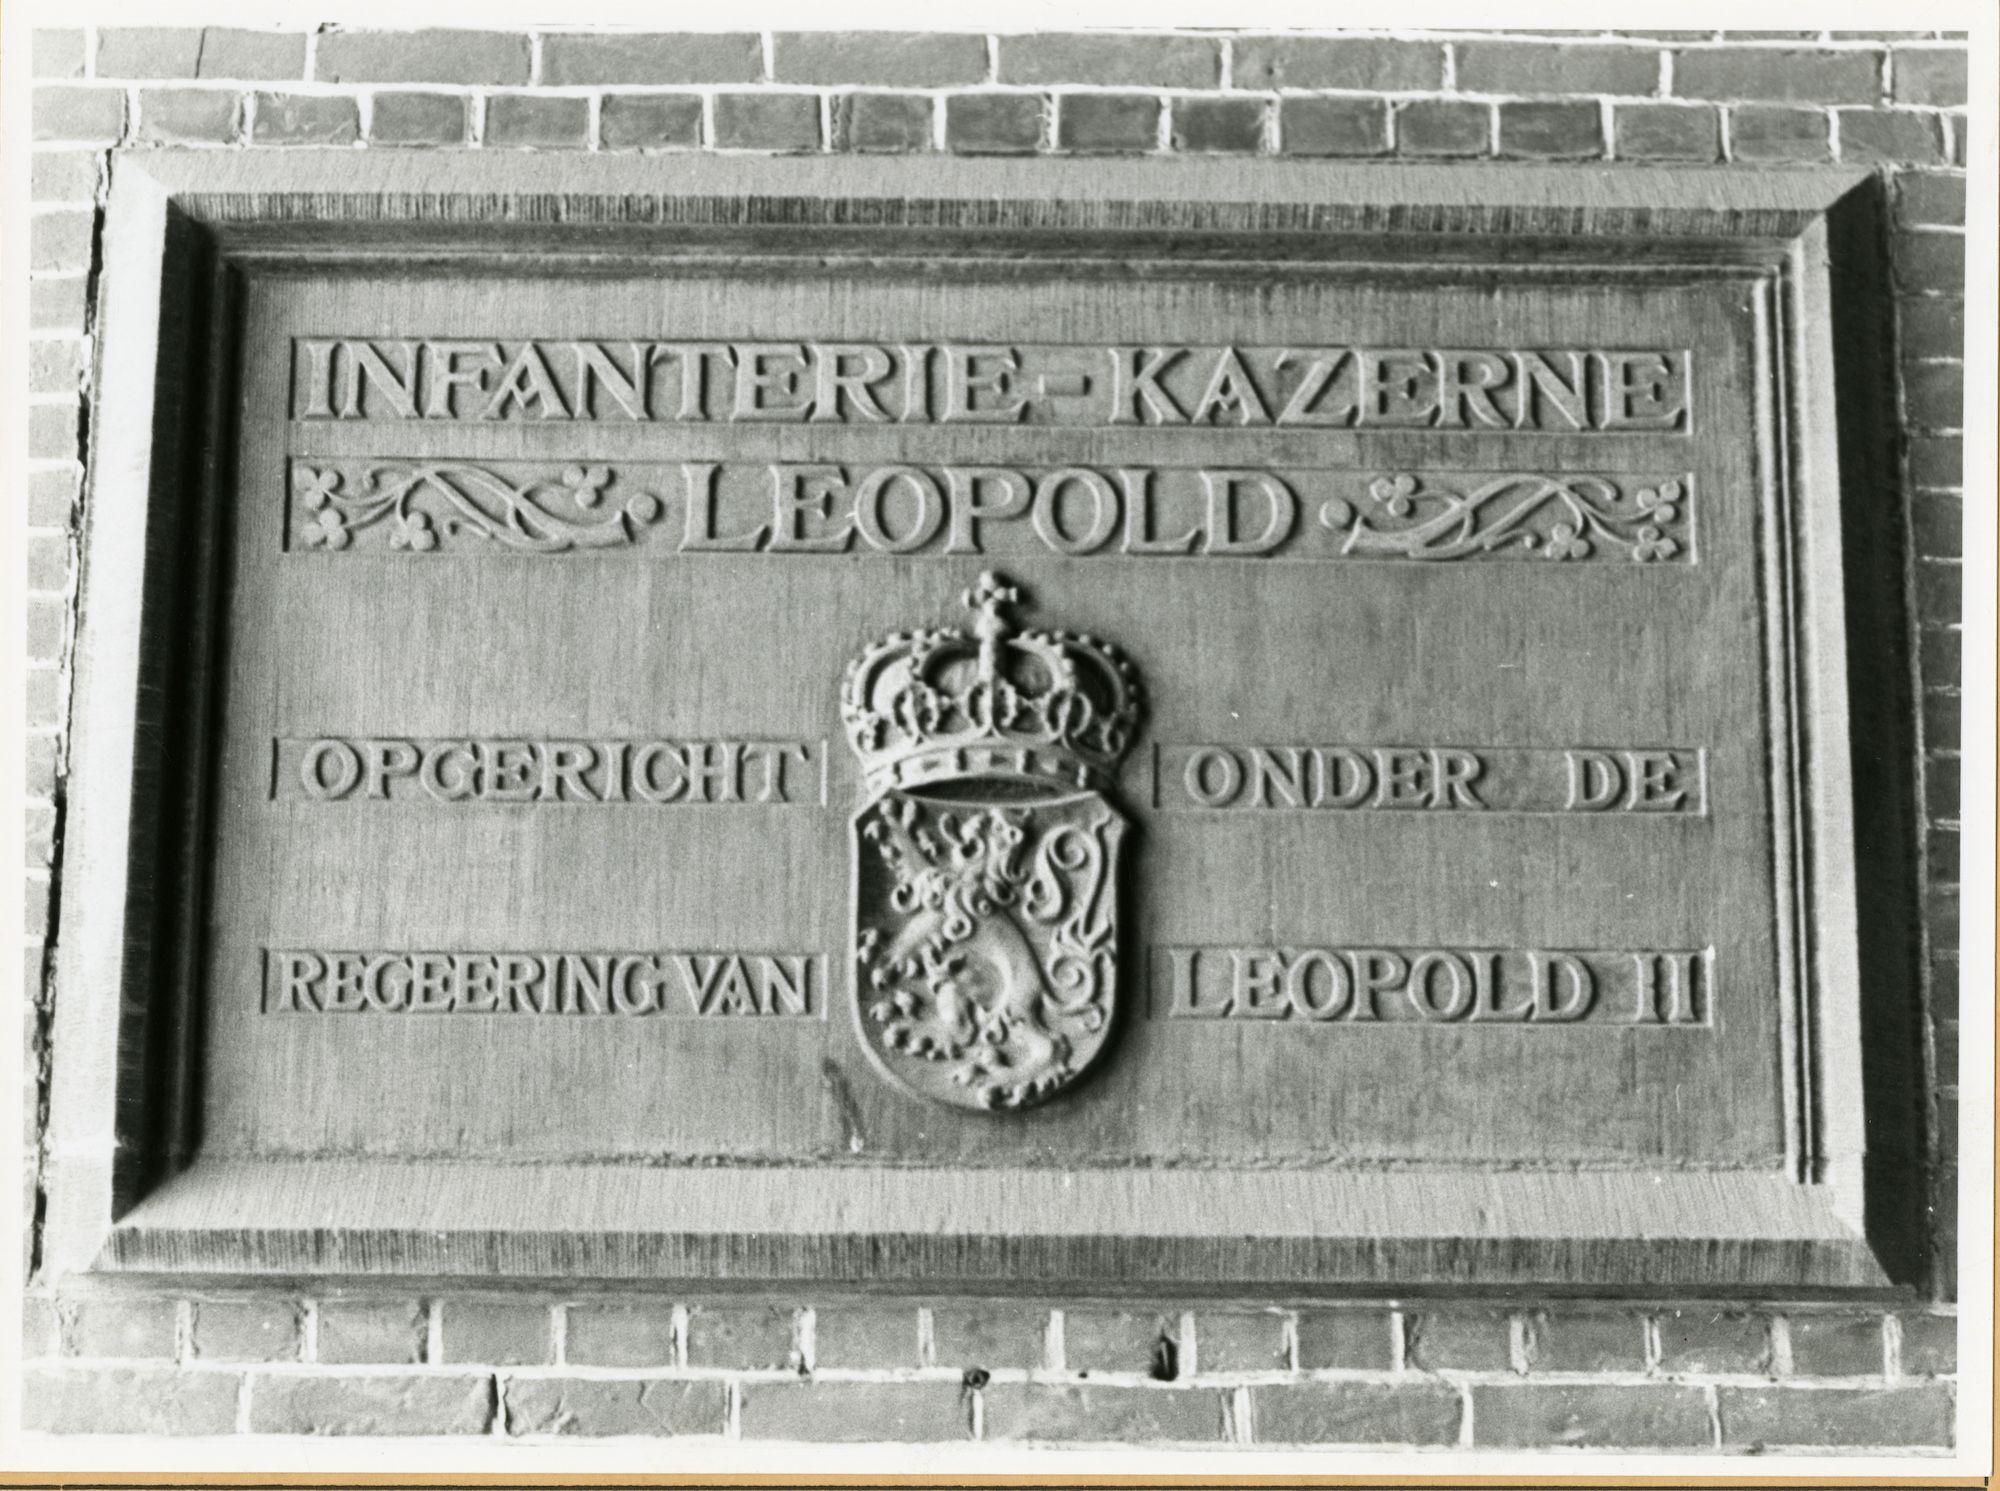 Gent: Gaspar De Craeyerstraat 2: Leopoldskazerne: gedenksteen: Leopoldskazerne, 1979